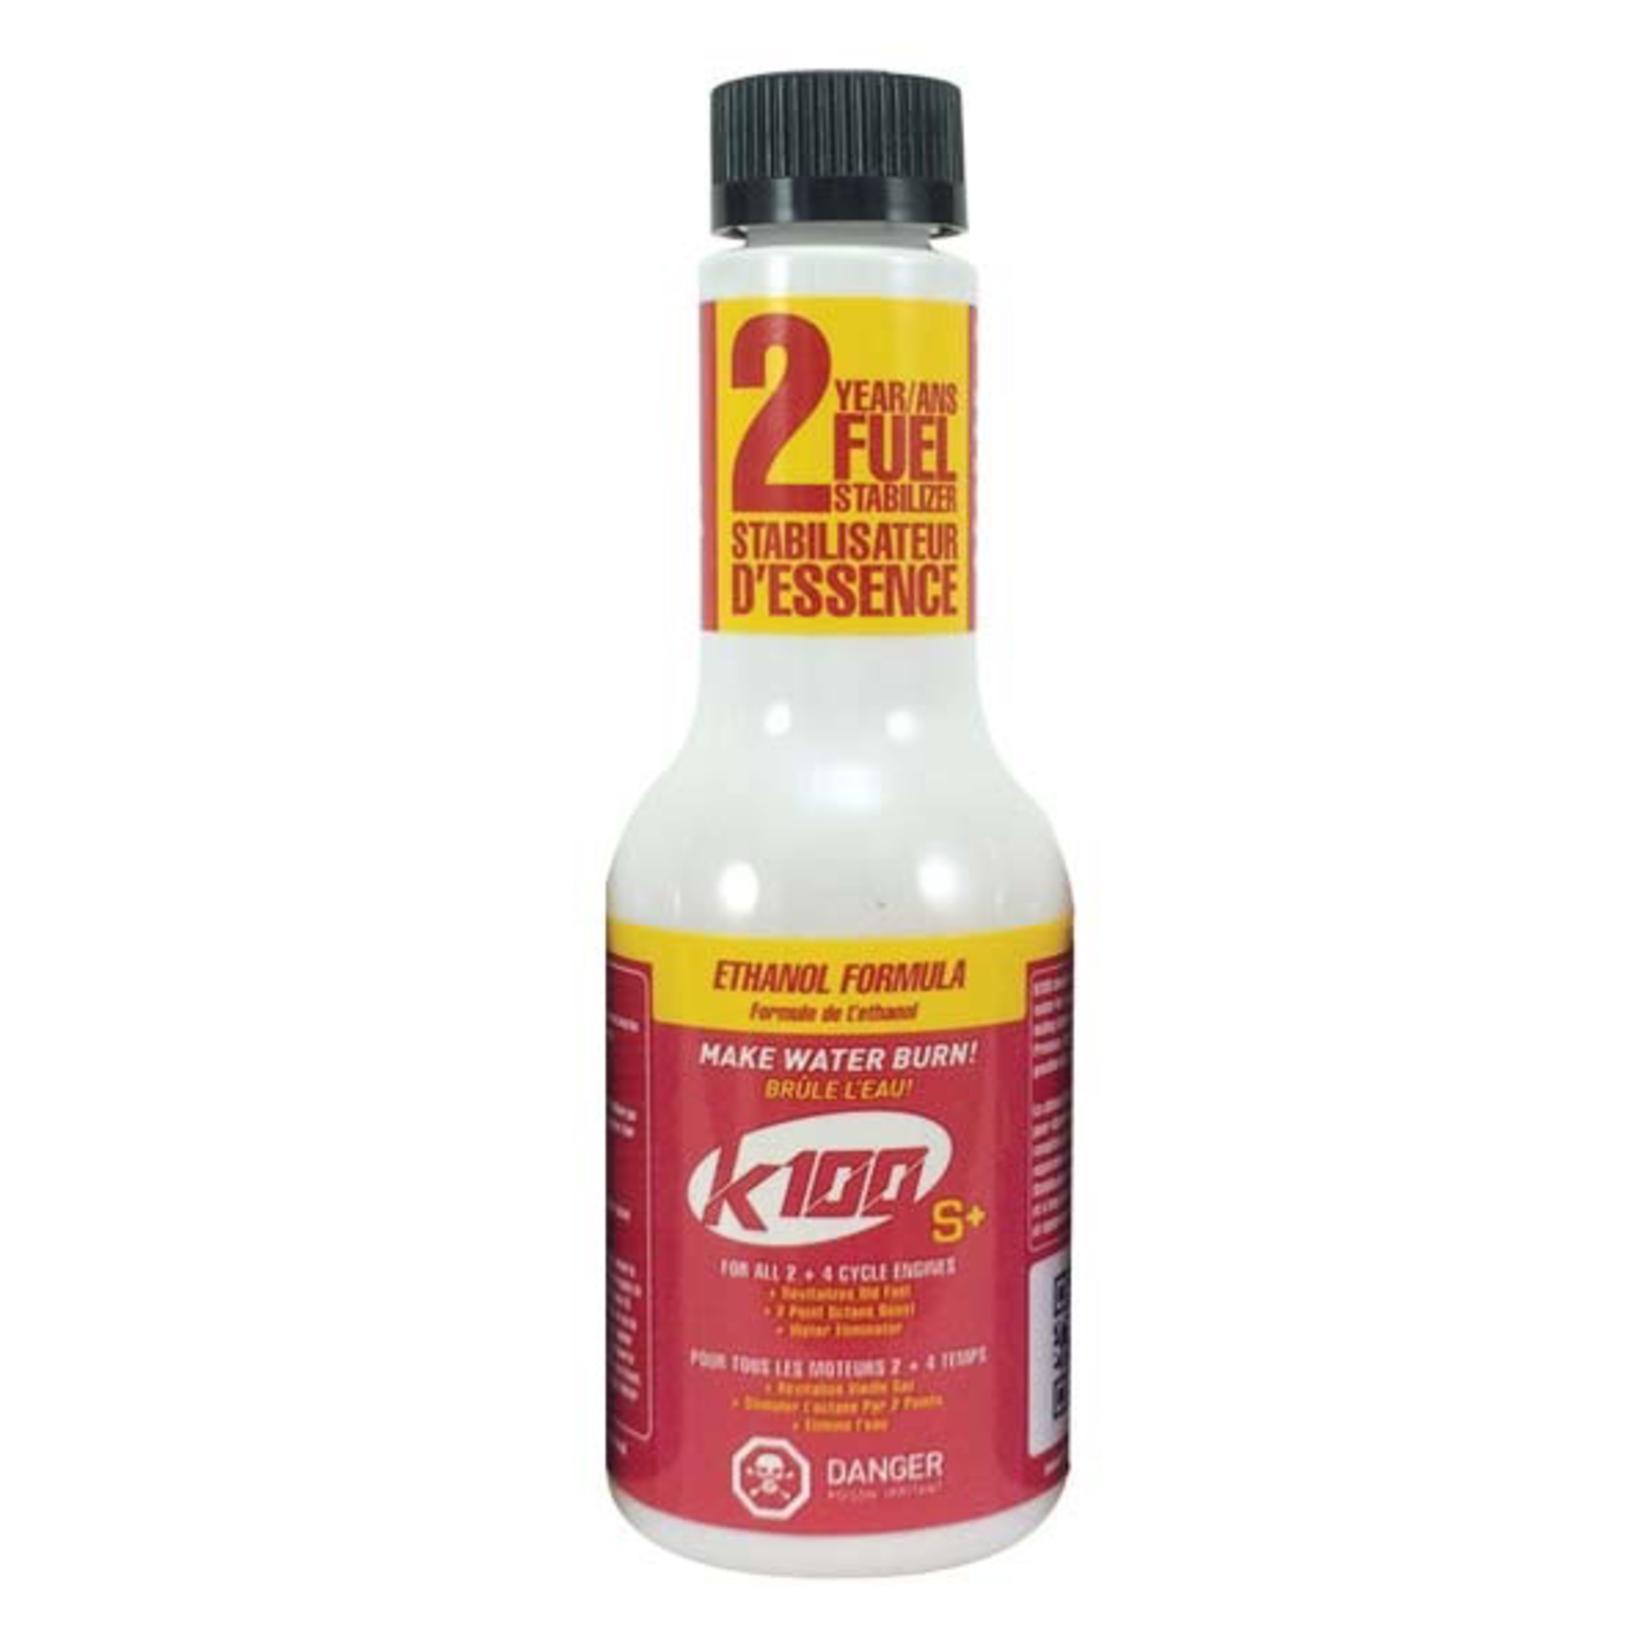 Fuel Stabilizer, K100 8oz Bottle